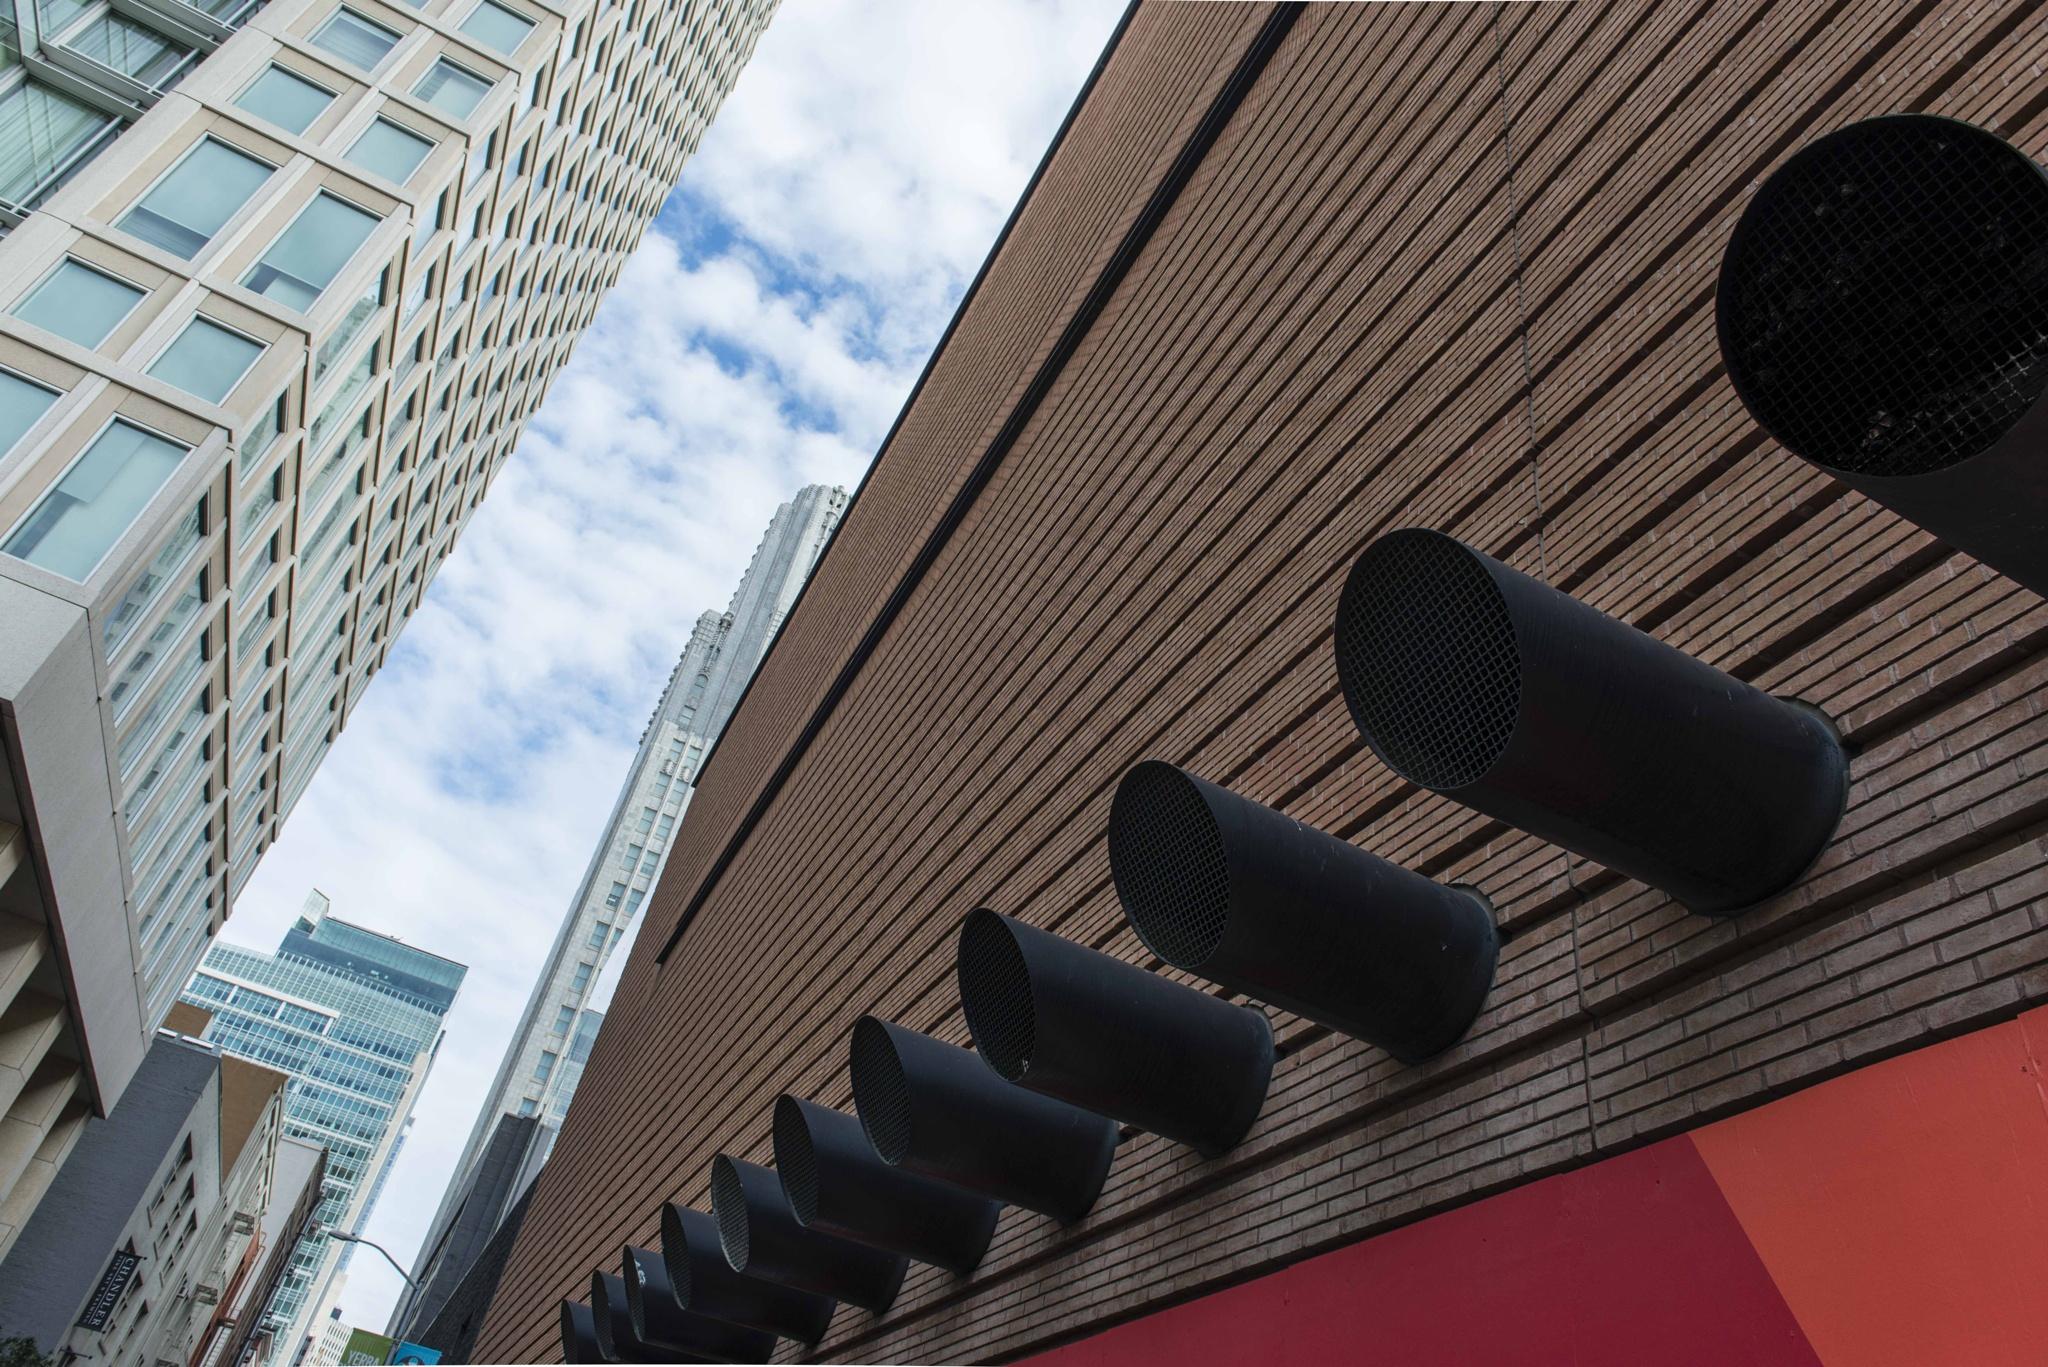 SF Museum of Modern Art by Long Xu